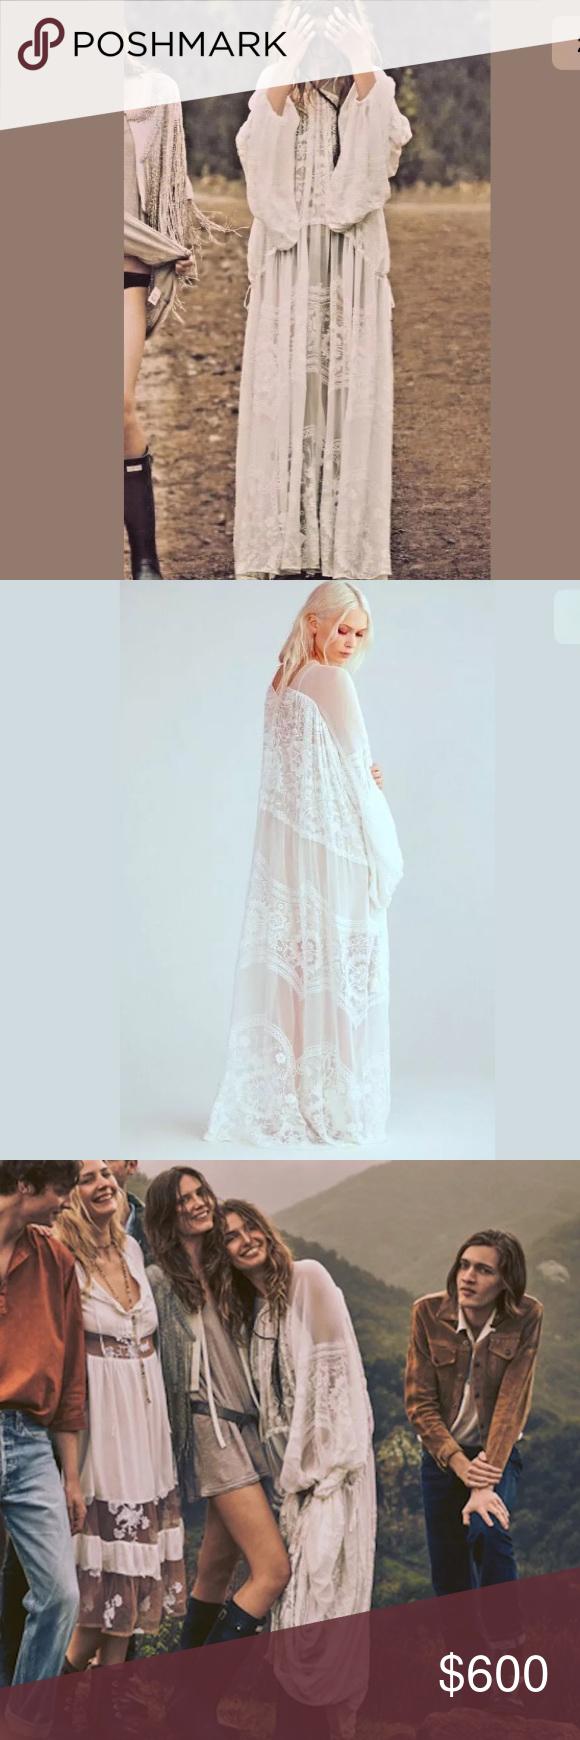 Wedding dress nip slip  SOLD  Free People Bohemian Winds Maxi Dress NWT  Website